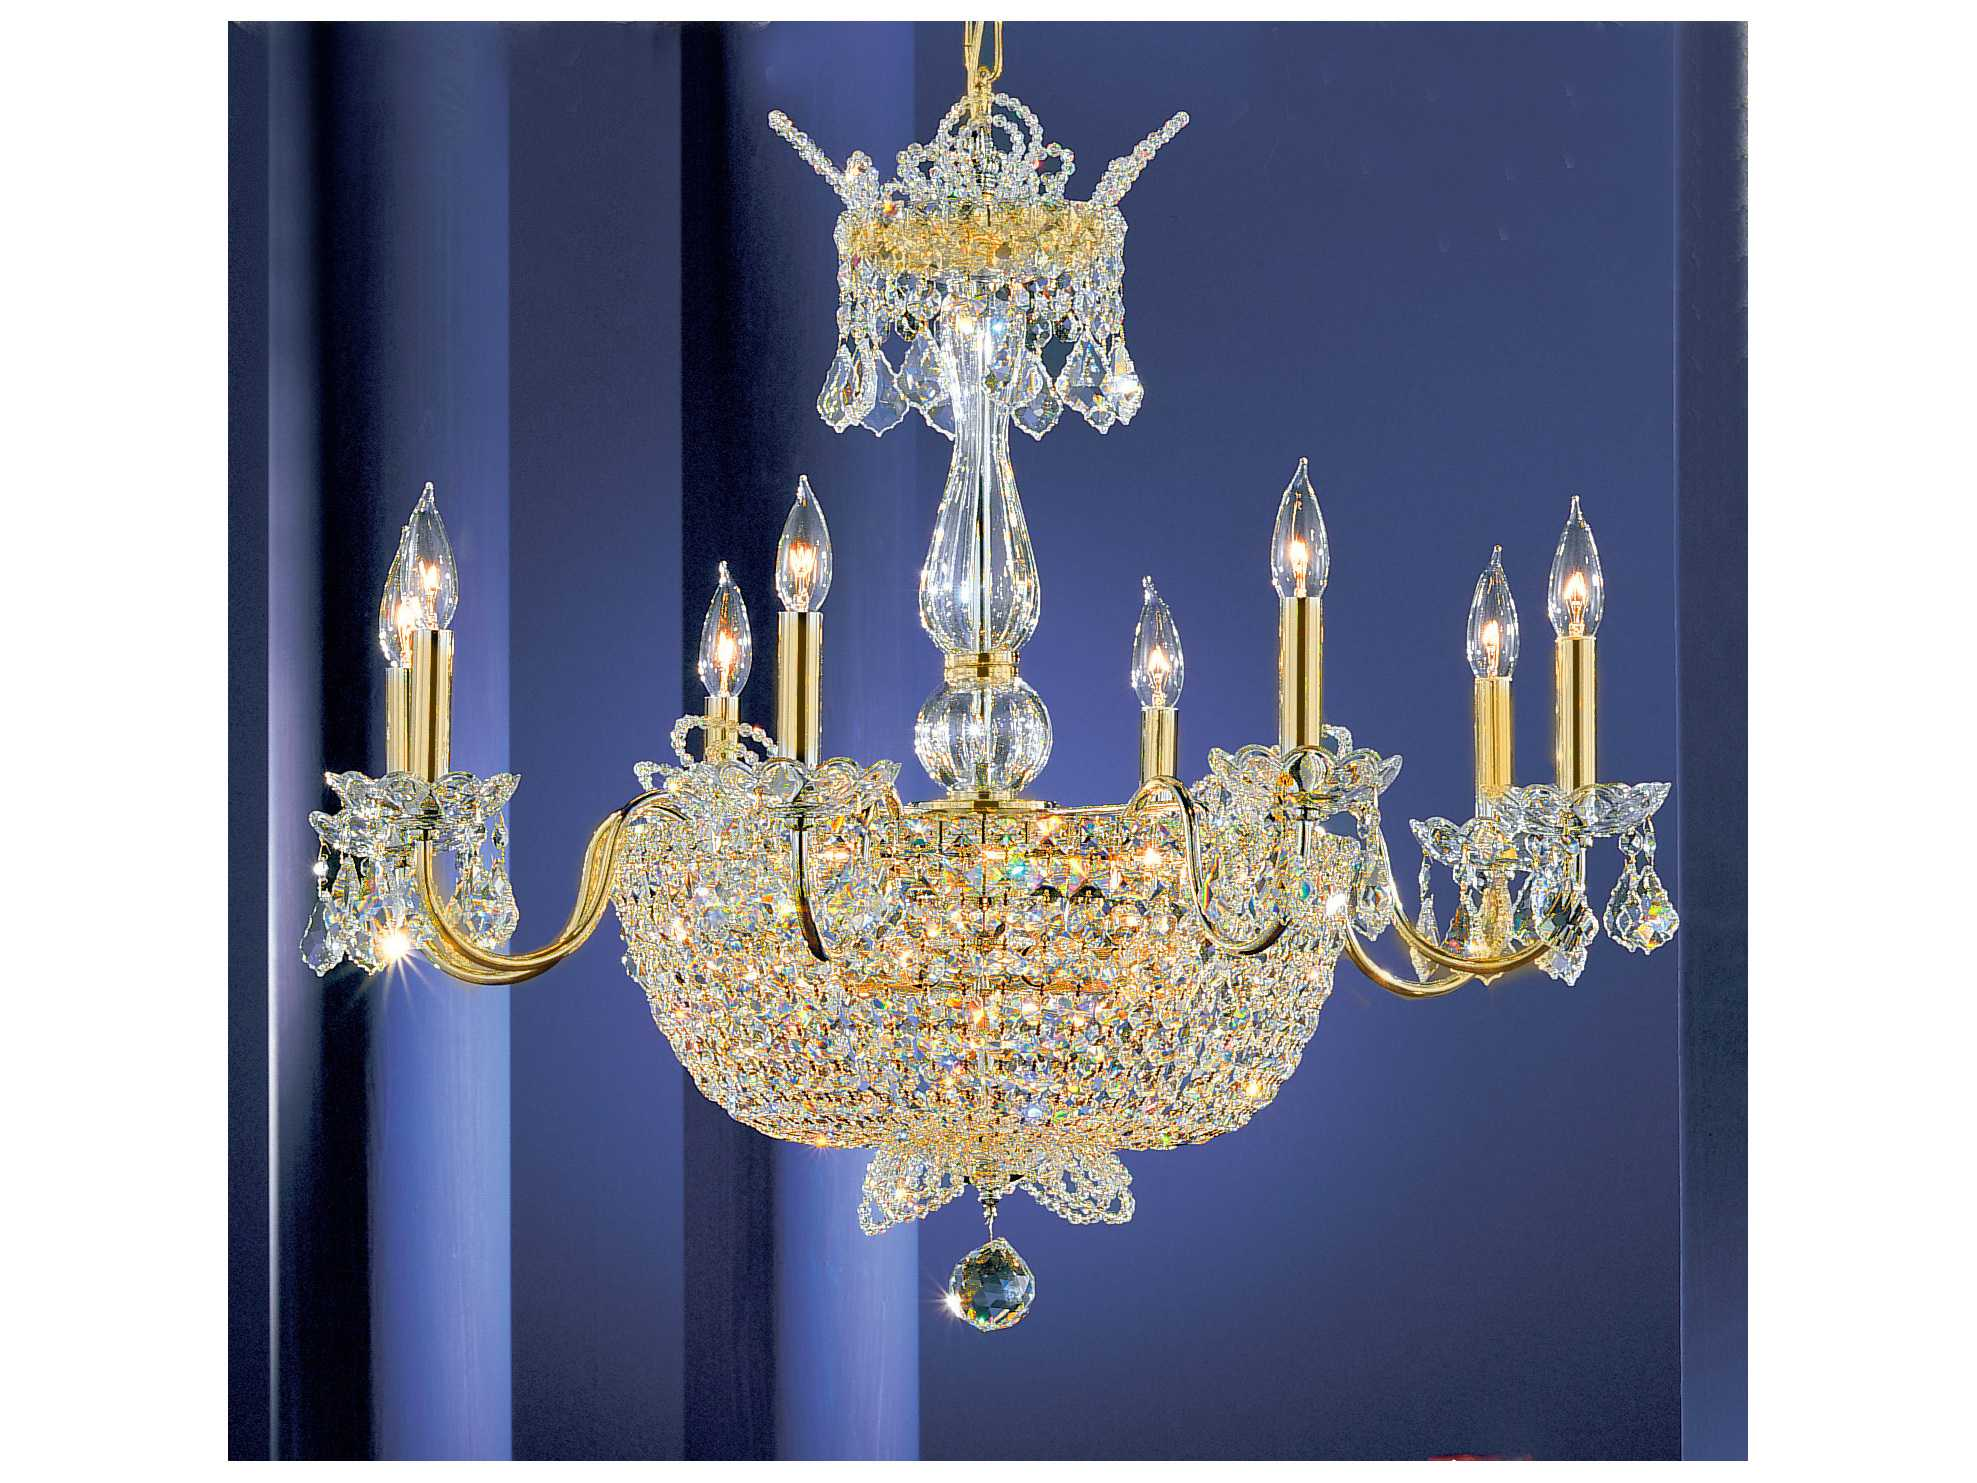 classic lighting corporation crown jewels 24 light 30 wide chandelier